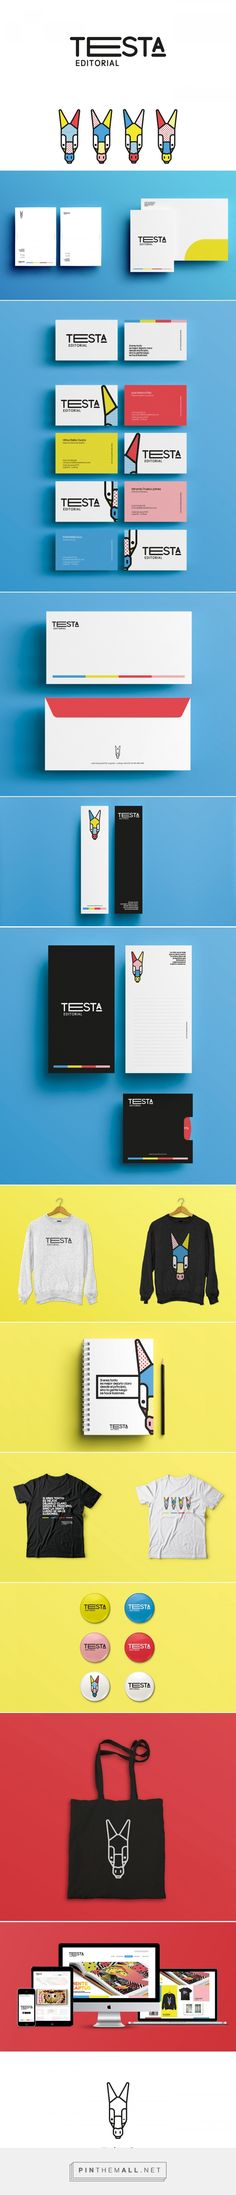 Testa Editorial Branding by Alvaro Jaimes | Fivestar Branding Agency – Design and Branding Agency & Curated Inspiration Gallery